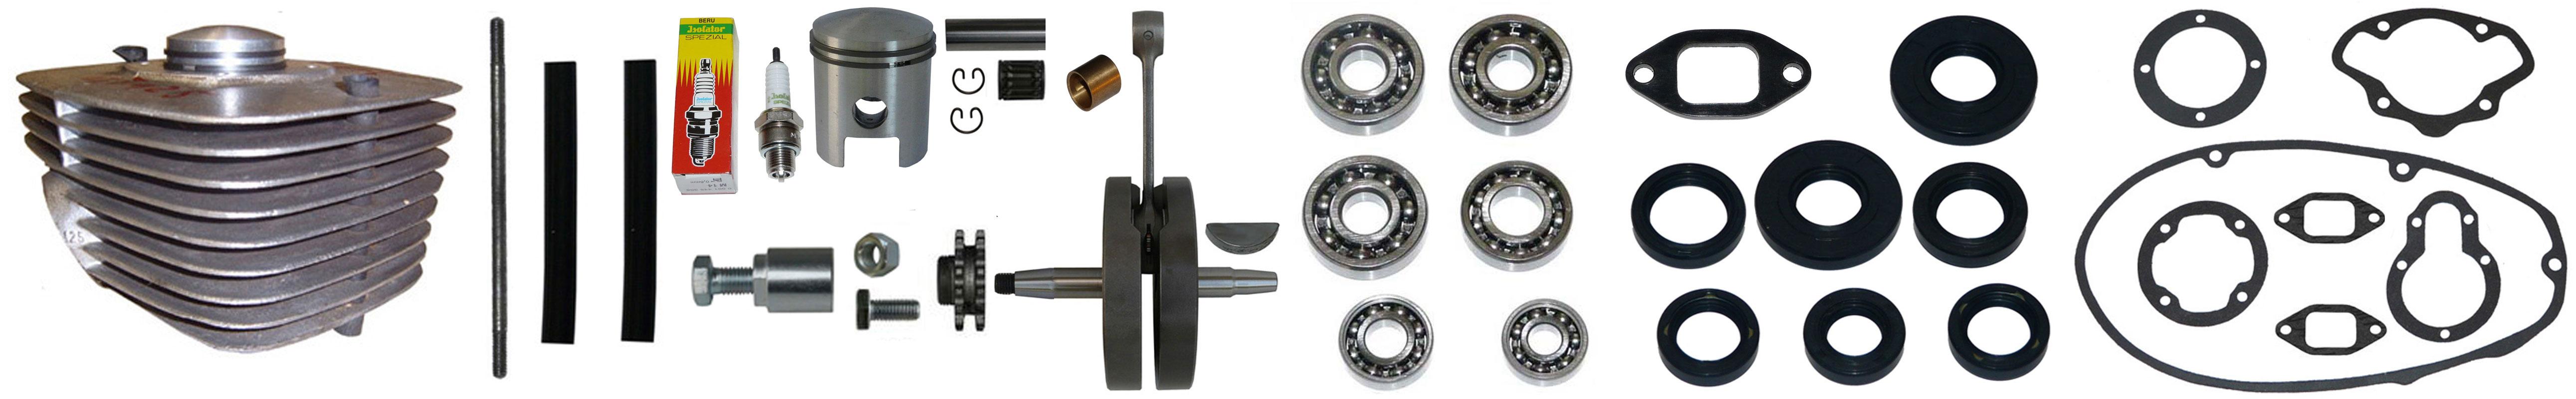 MZ ES 125 150 Ersatzteile Motor Zylinder Kurbelwelle